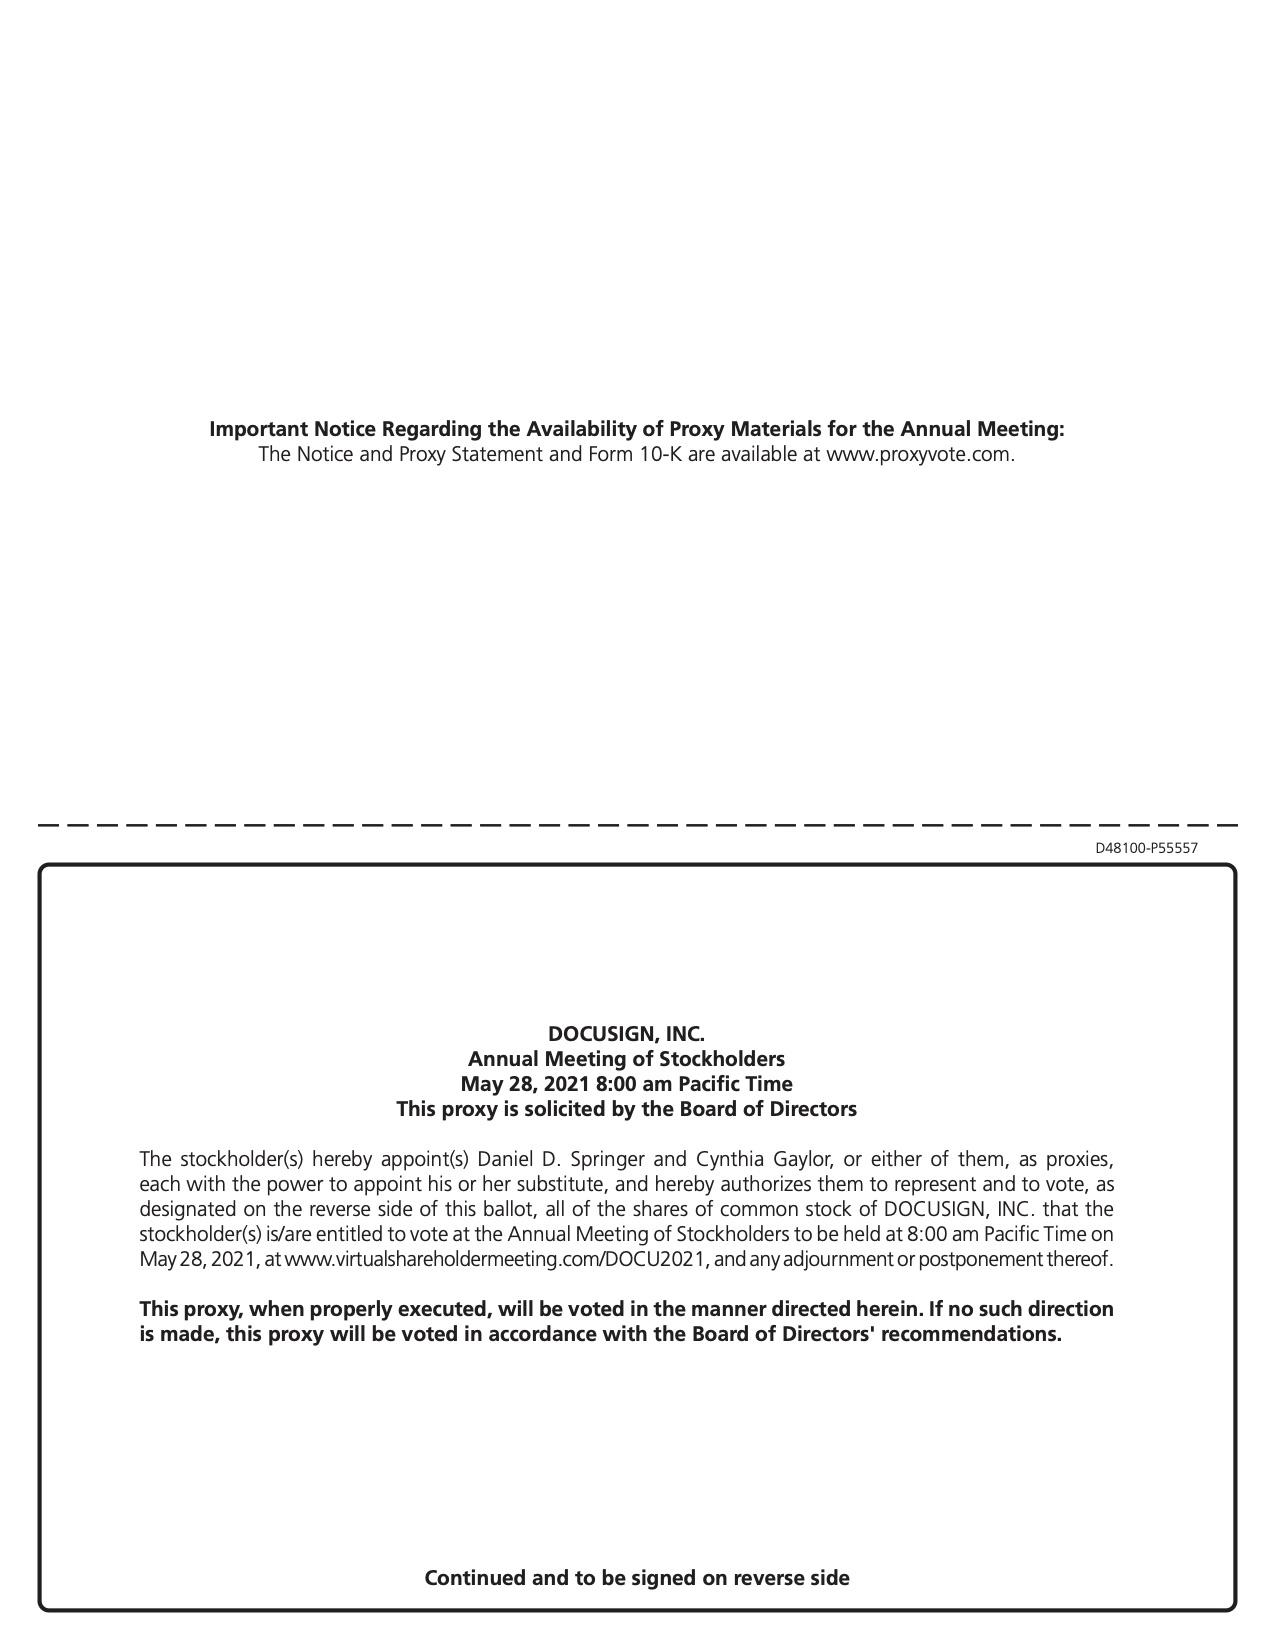 DOCUSIGNINCPROXYNOTICE1.JPG